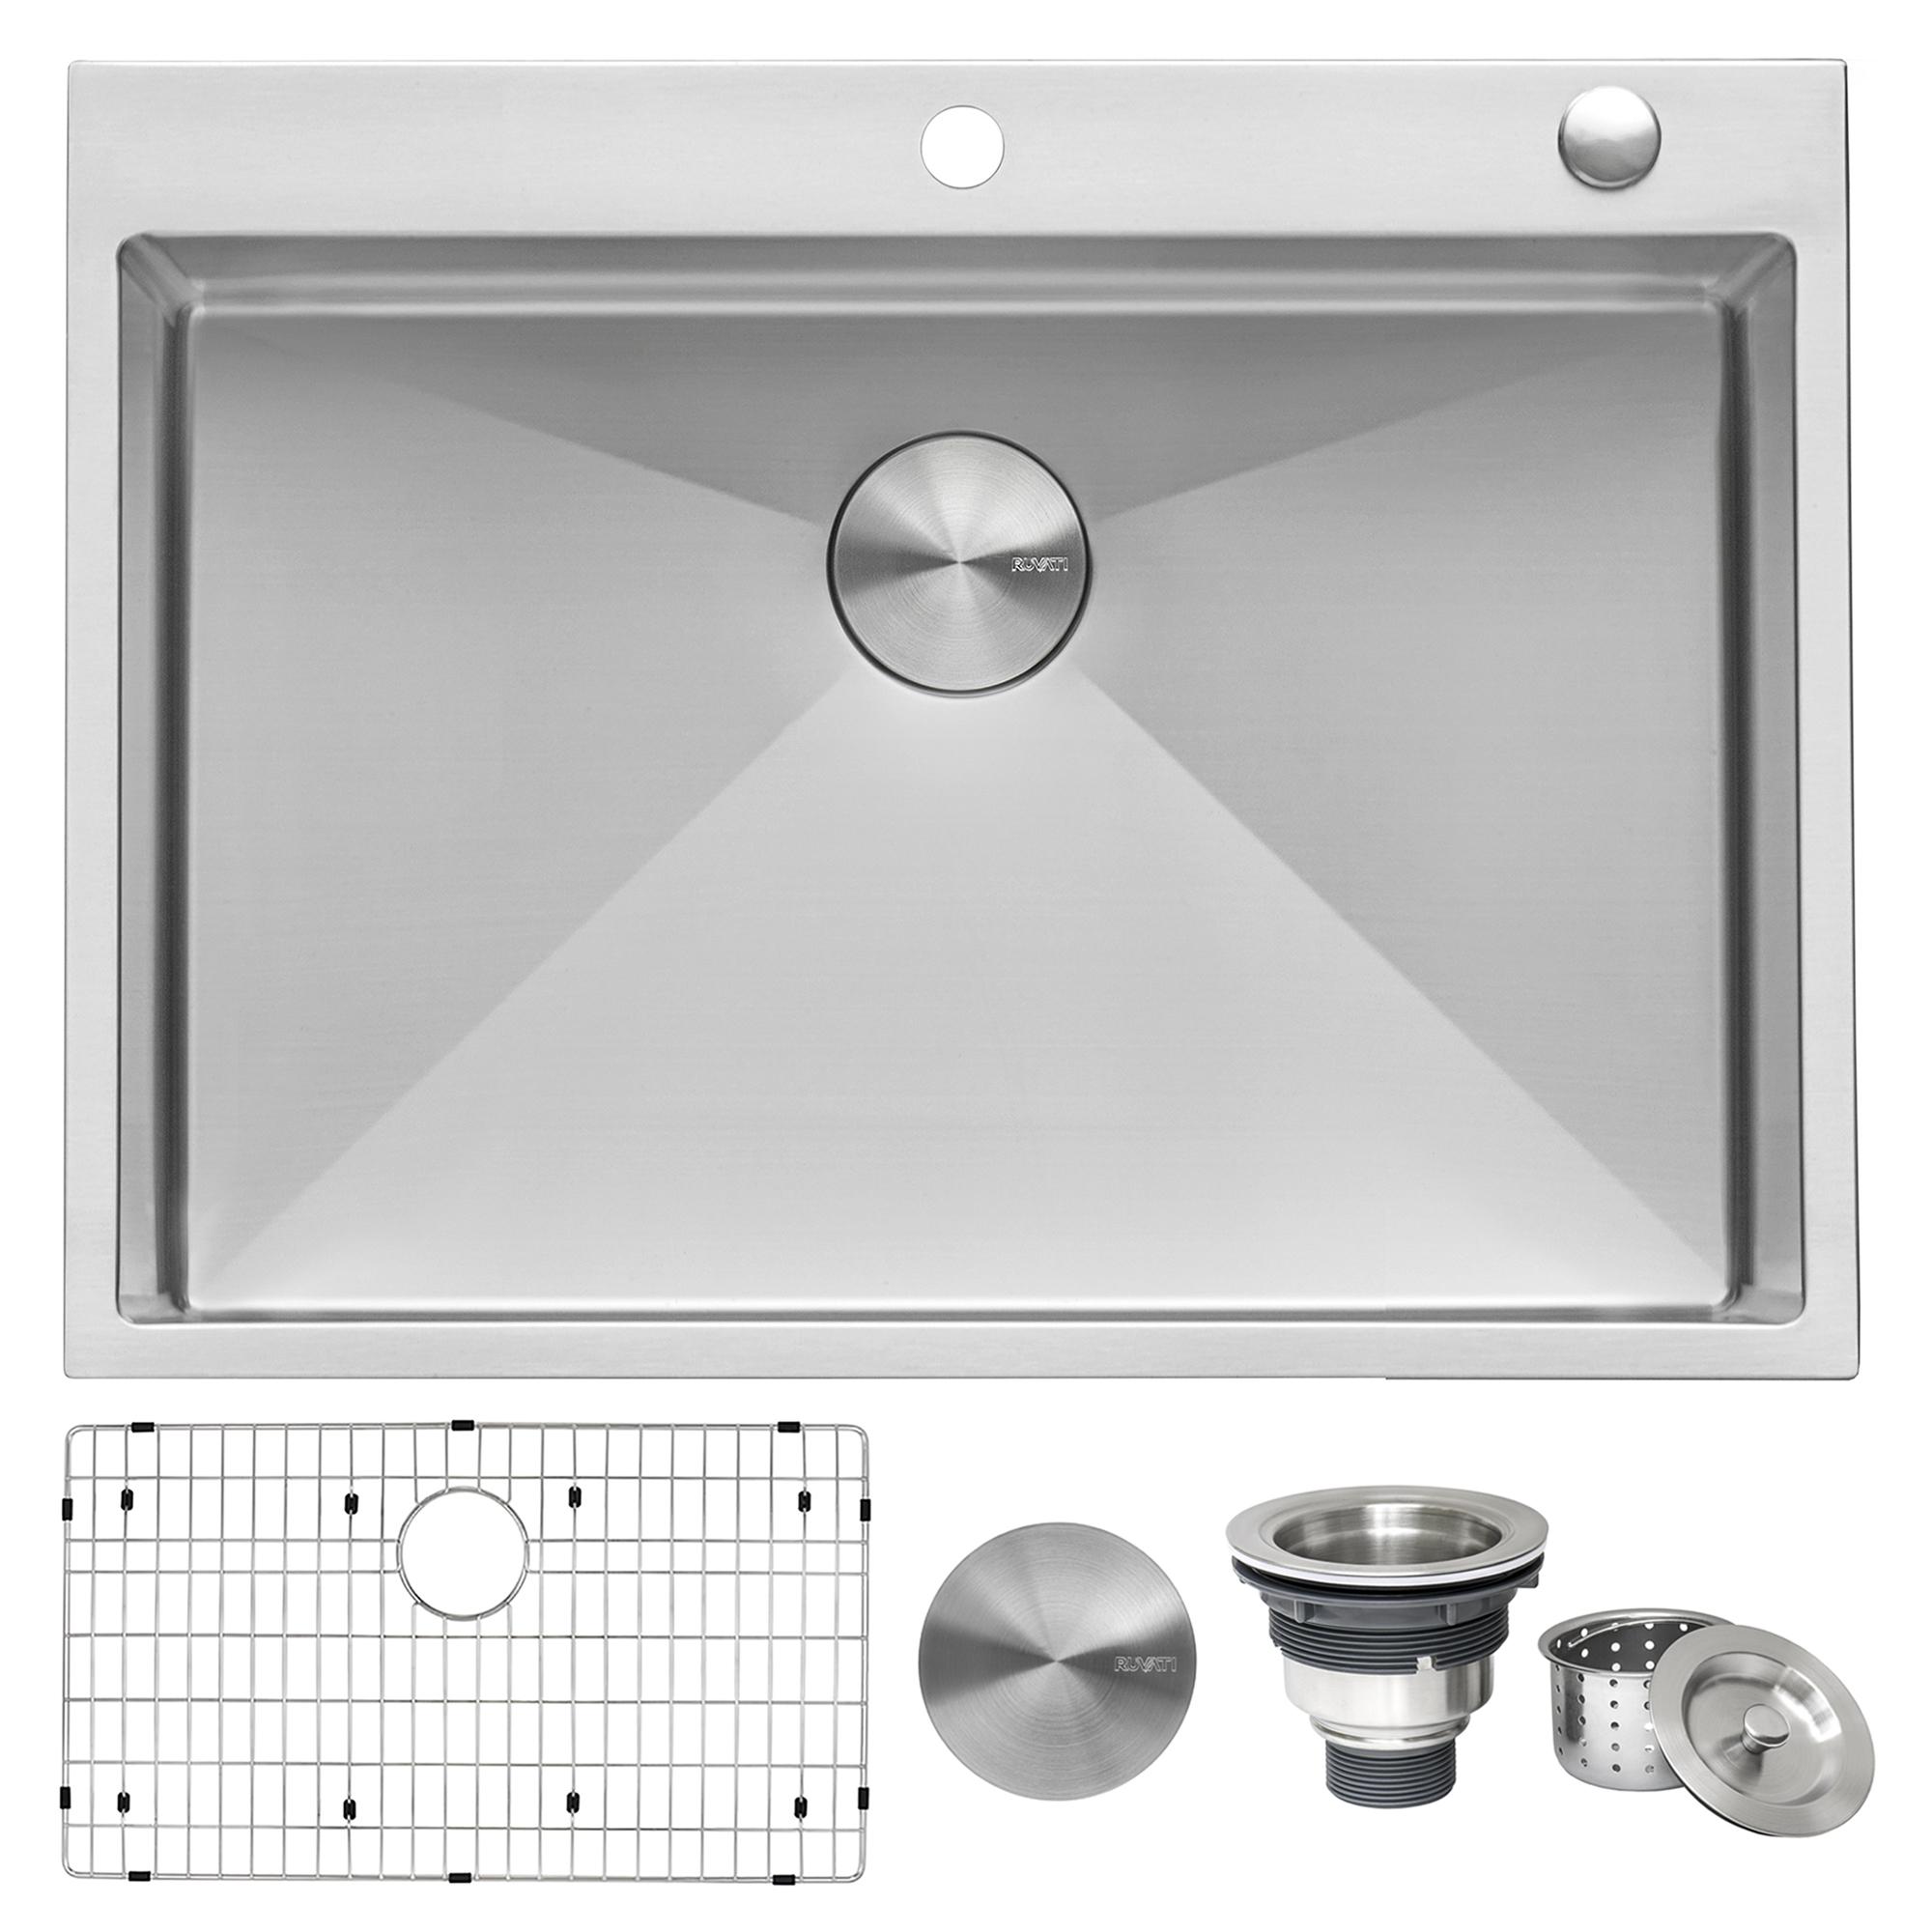 30 X 22 Inch Drop In Tight Radius Topmount 16 Gauge Stainless Steel Kitchen Sink Single Bowl Ruvati Usa